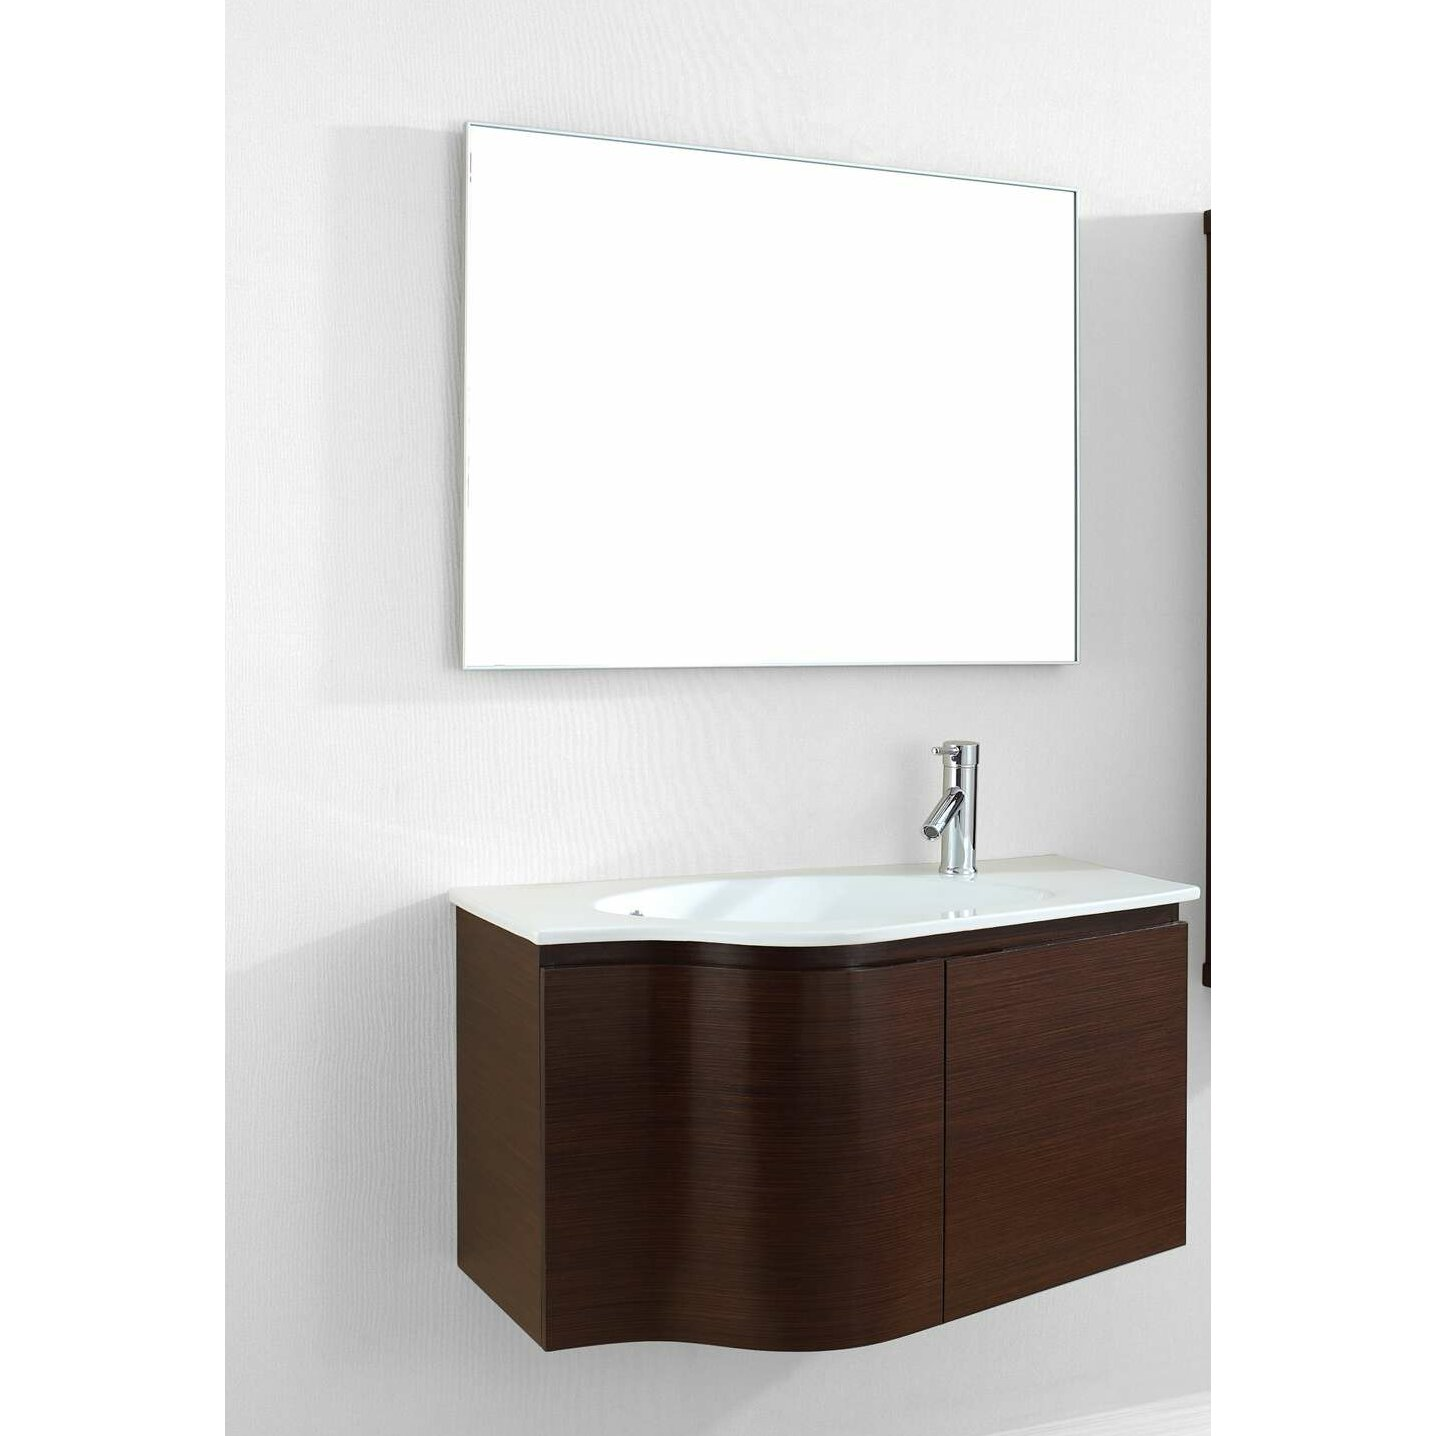 Virtu roselle 35 single floating bathroom vanity set with for Bathroom vanity sets for sale